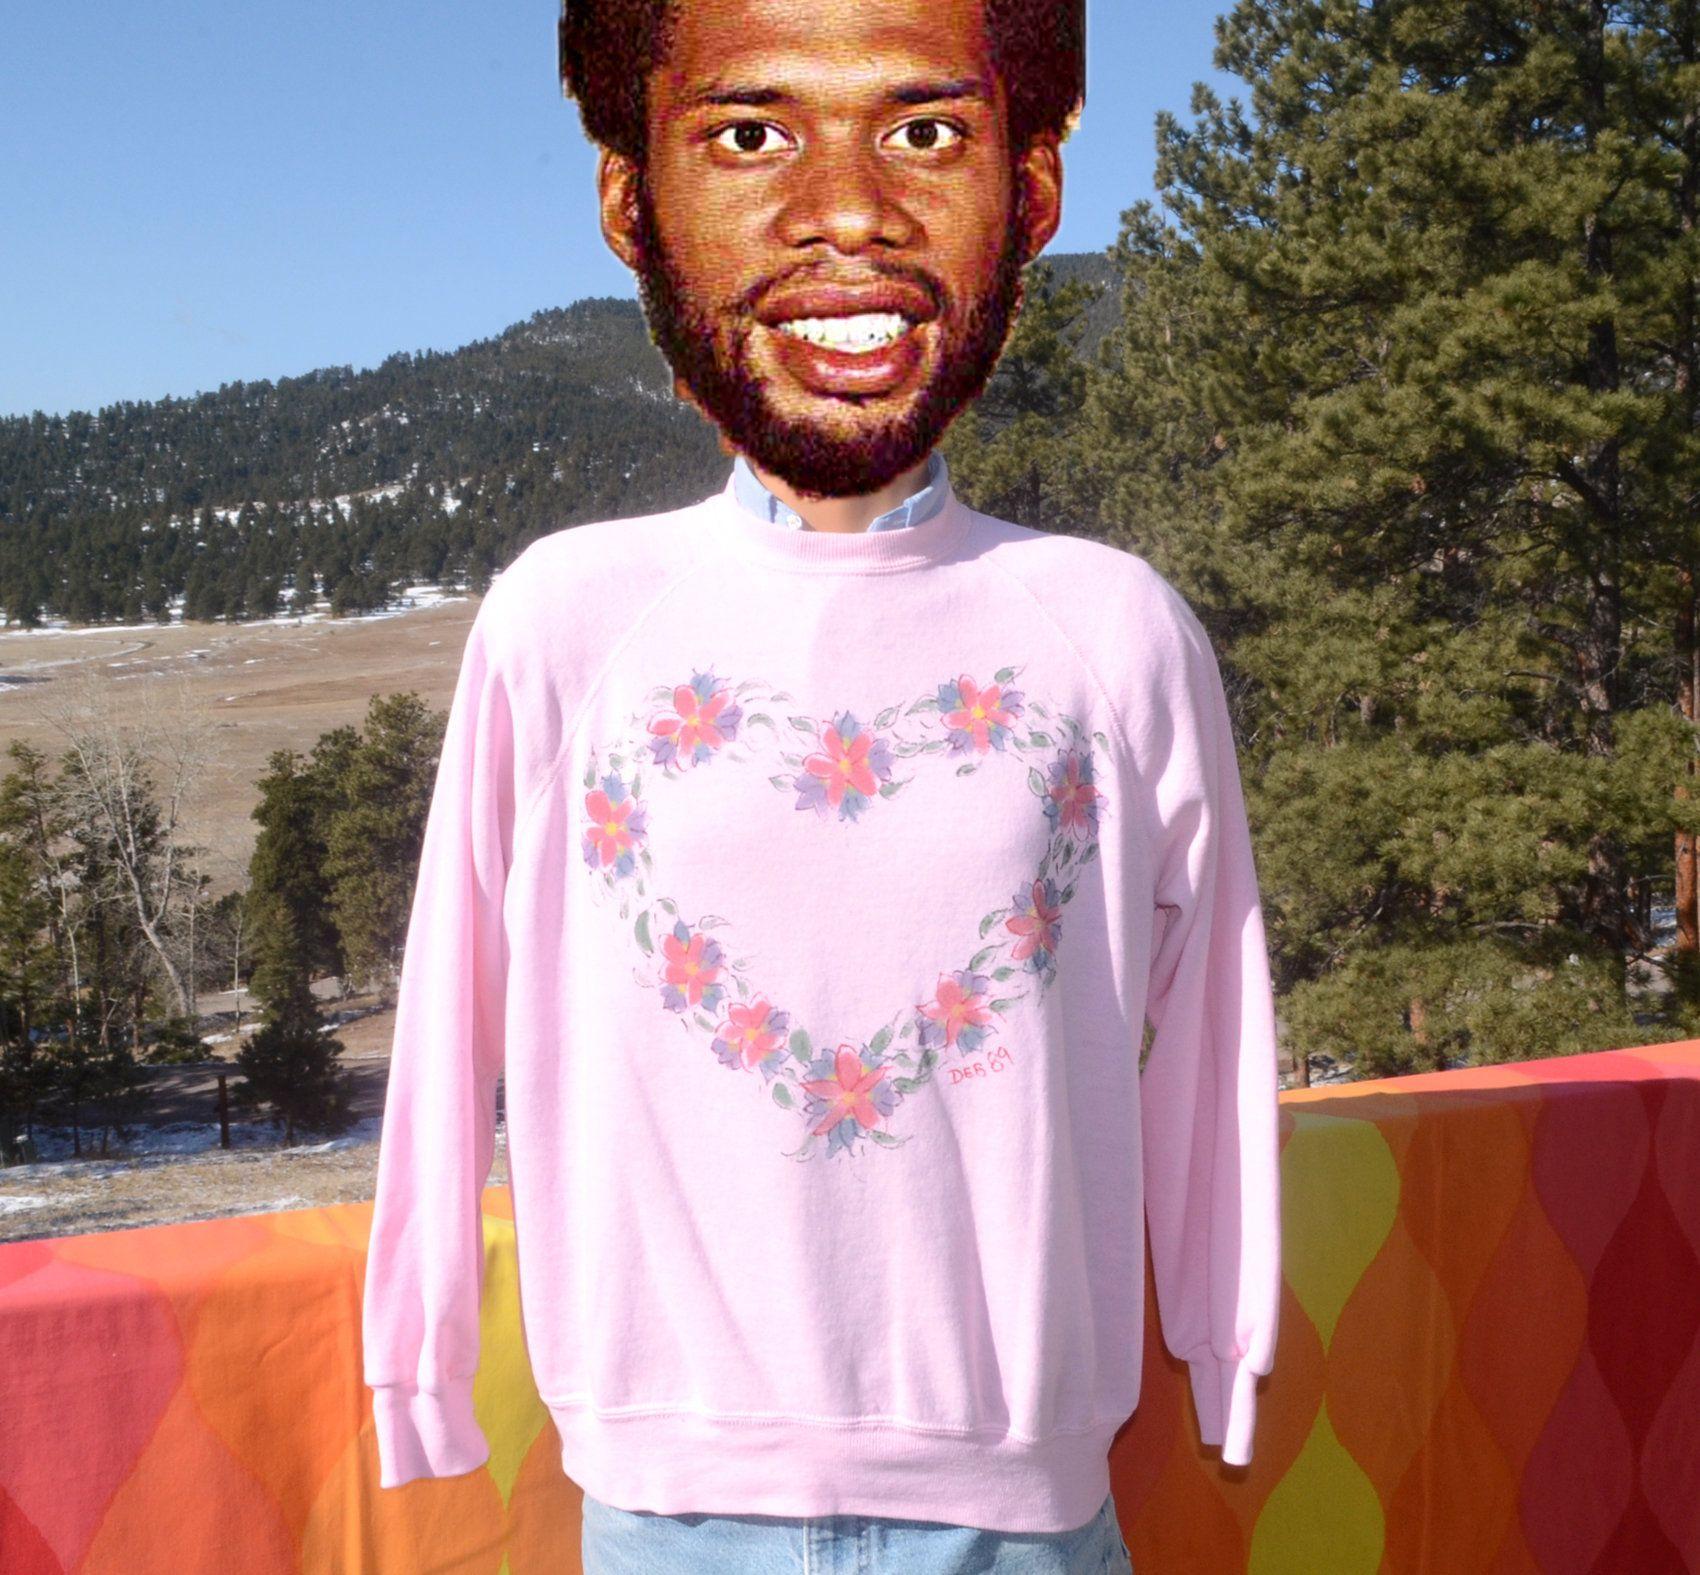 Vintage 80s Sweatshirt Crewneck Floral Heart Raglan Pink Large Wtf